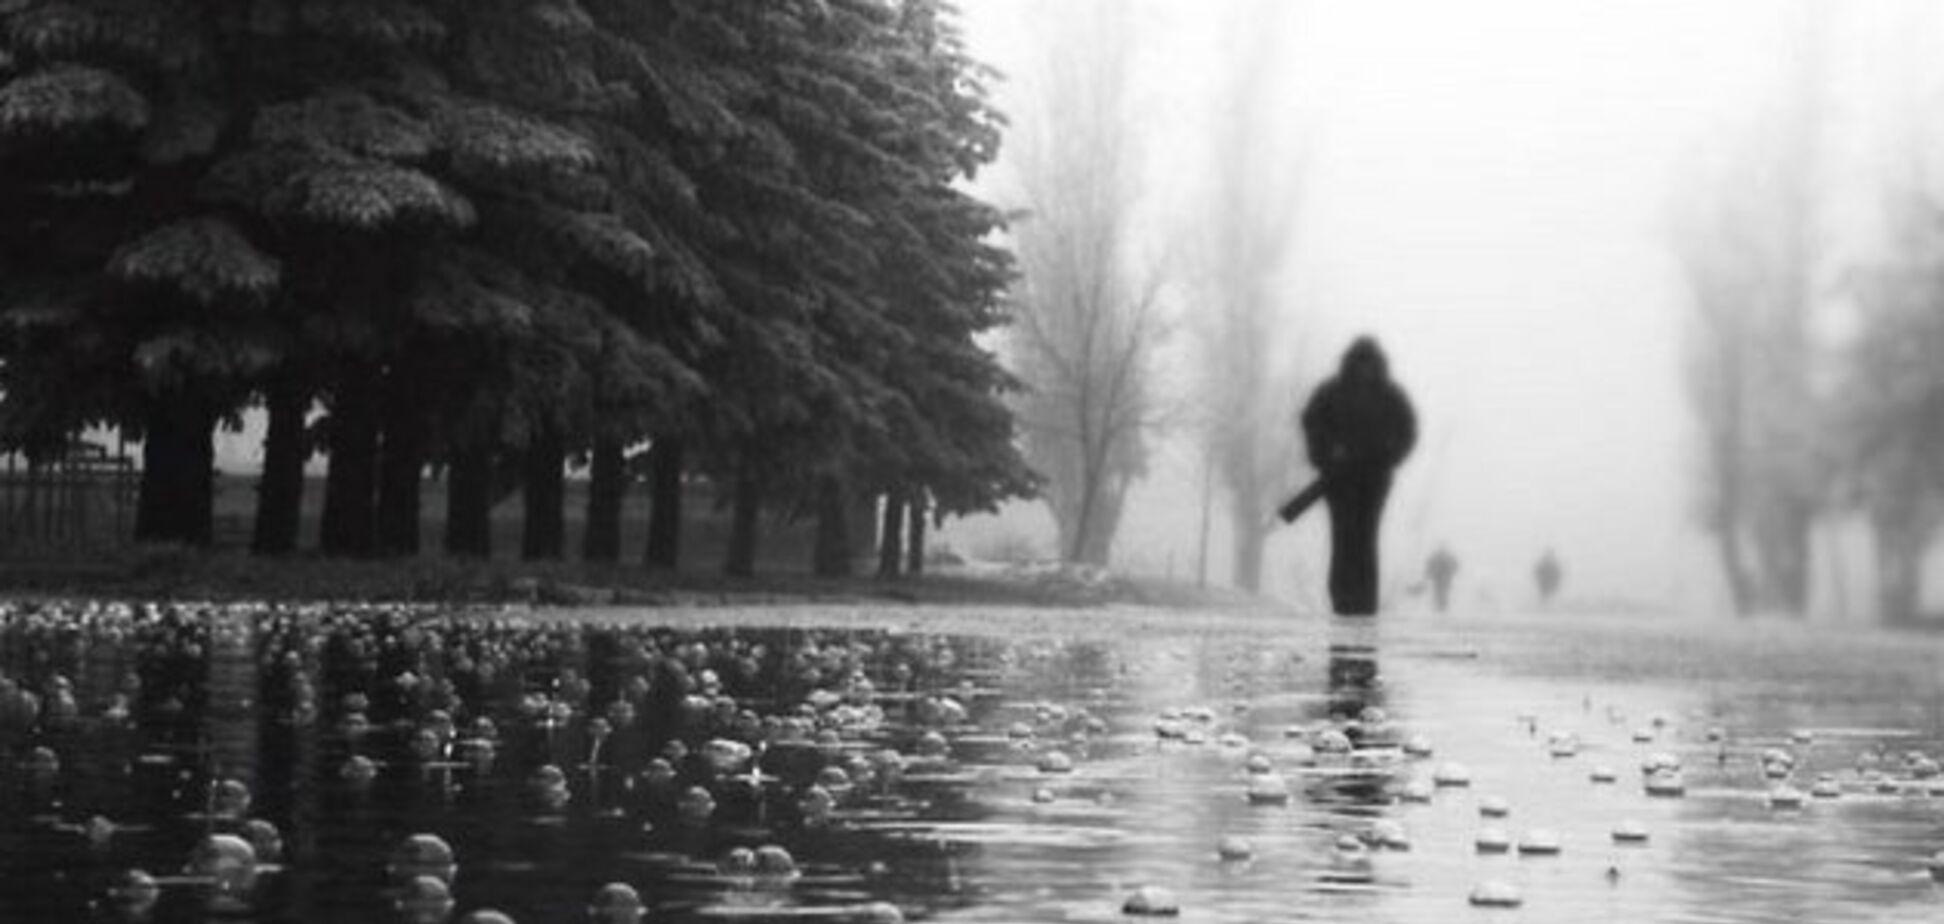 Дождливо и холодно: синоптик дала прогноз на последнюю субботу года